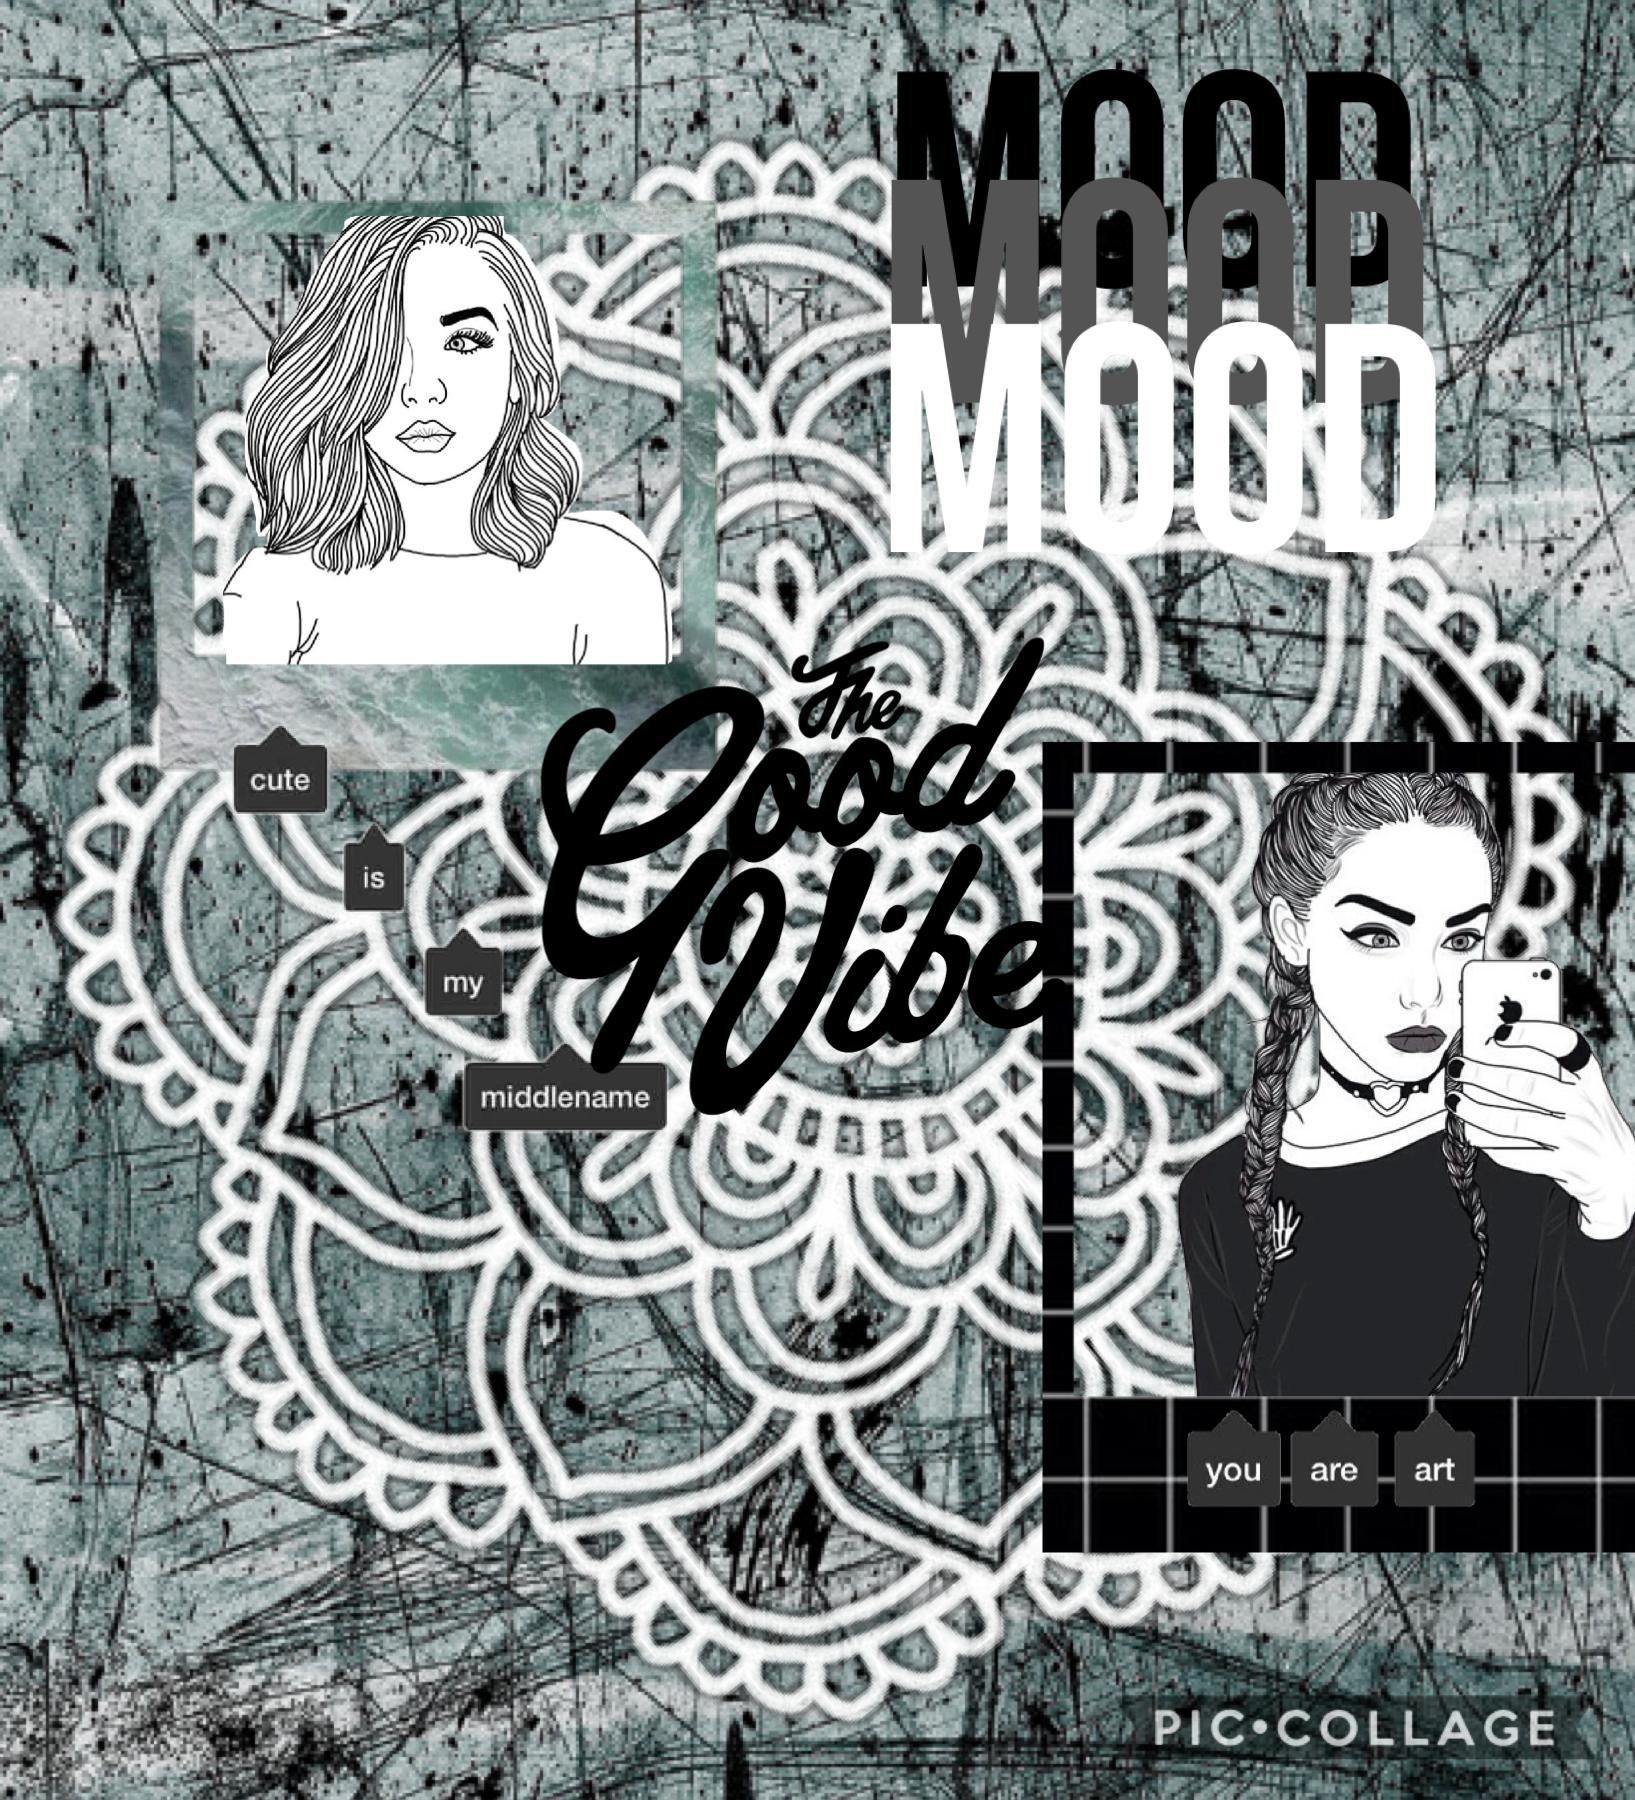 The good vibe #MOOD